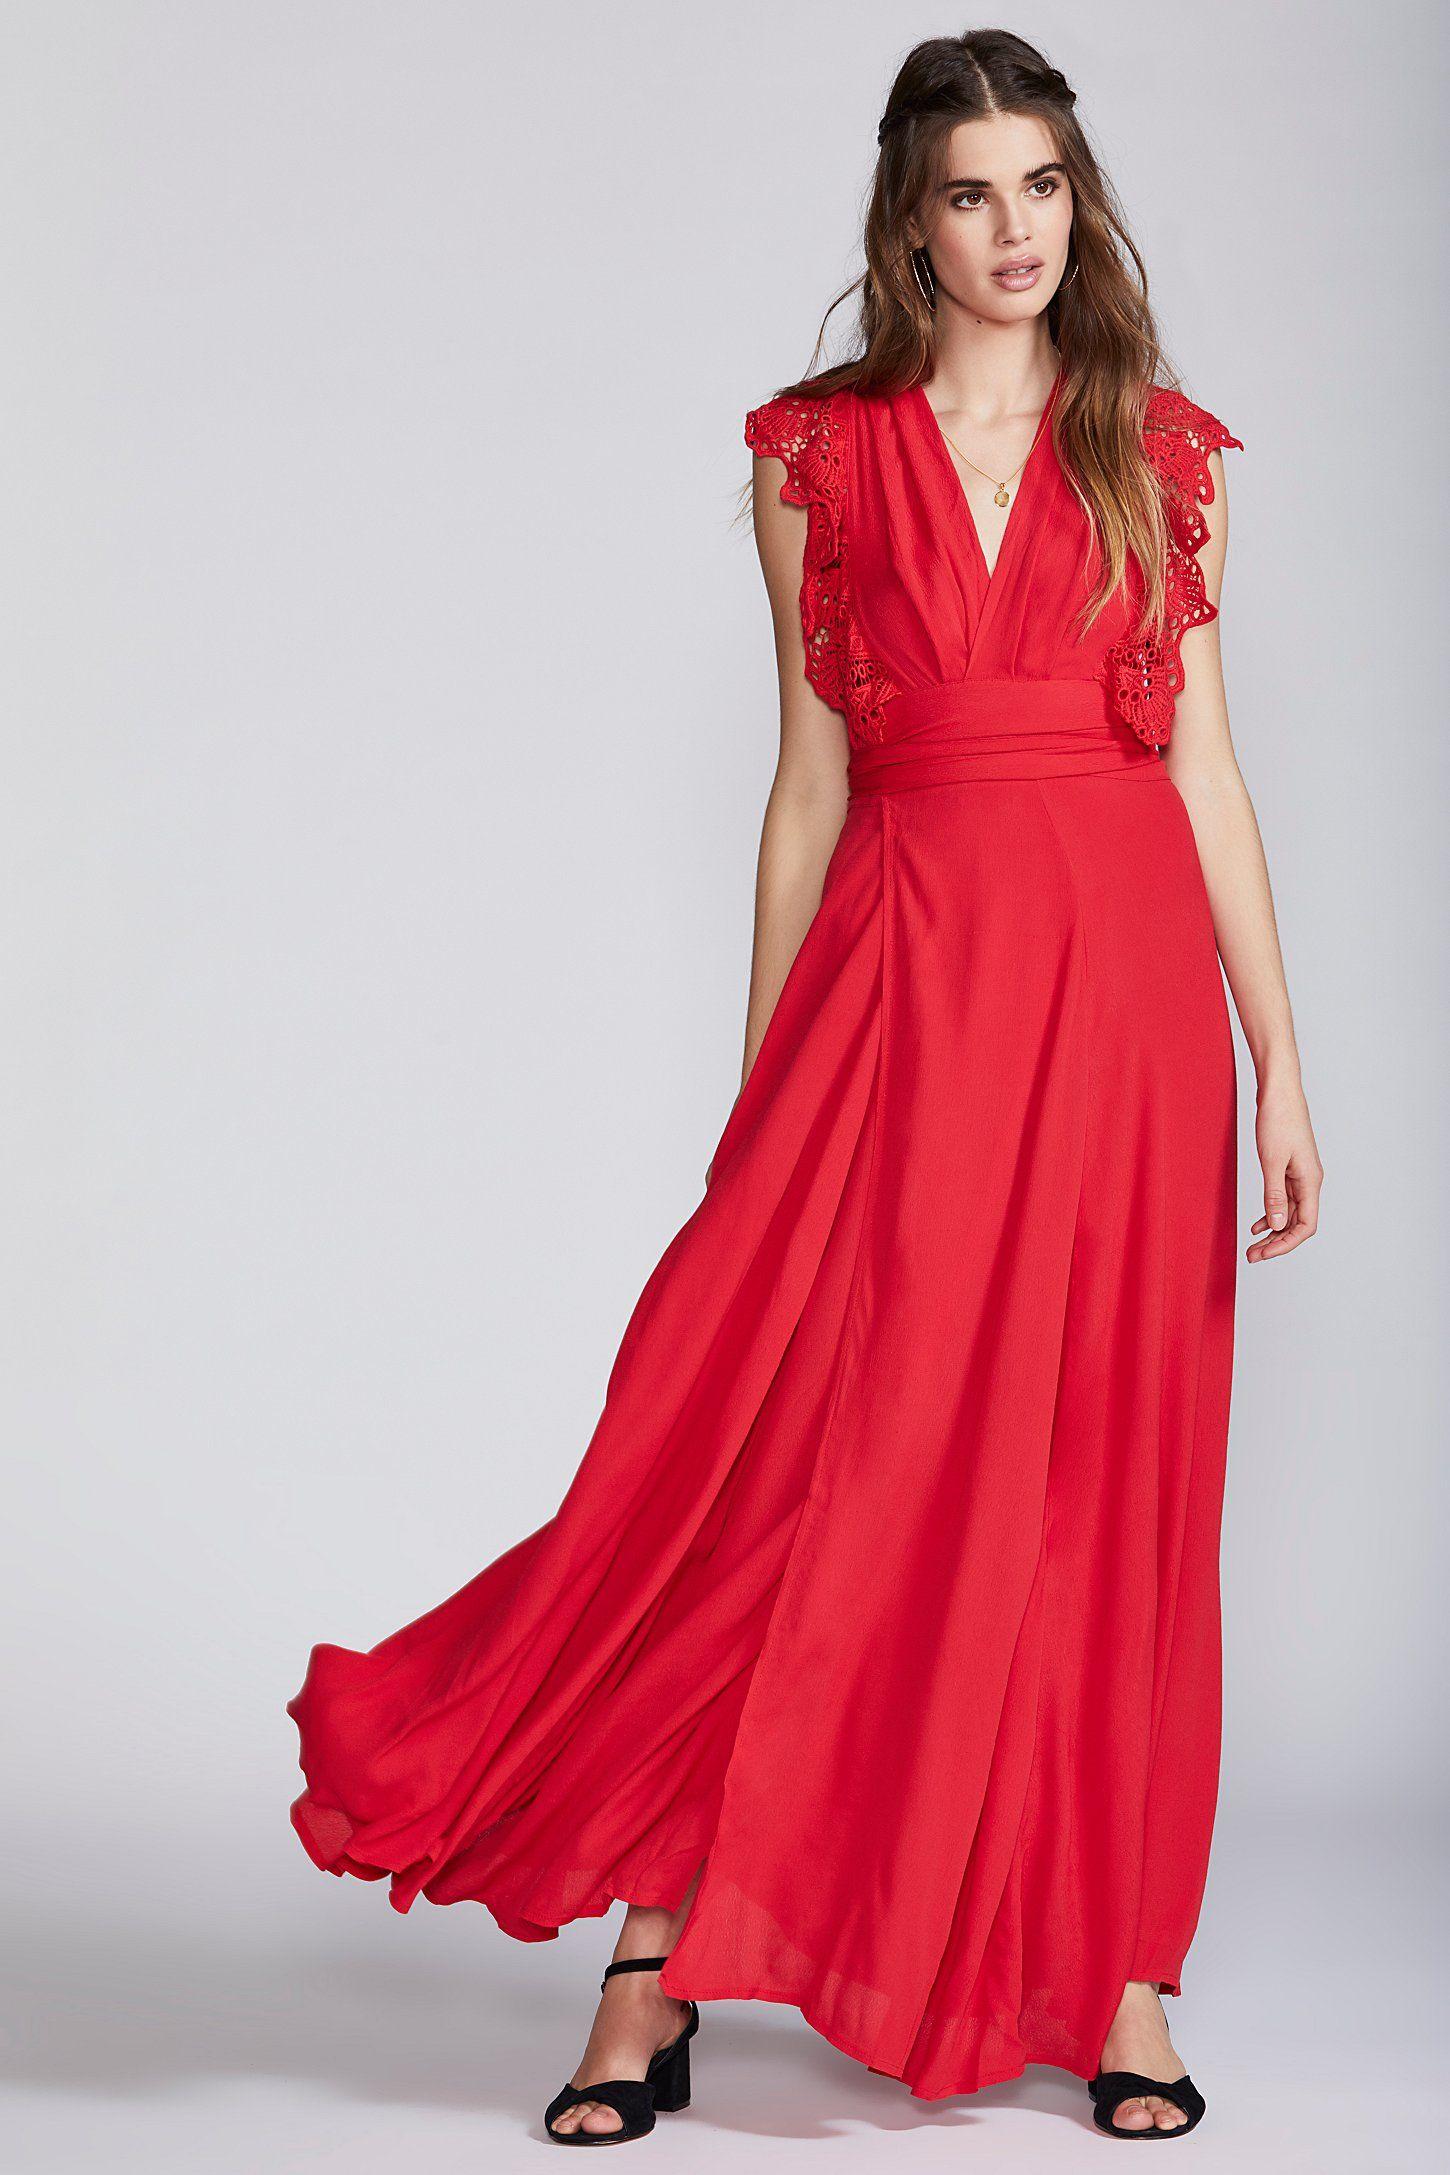 1b6d180f3cb13 Poppy Wrap Maxi Dress | summer style | Maxi wrap dress, Dresses ...